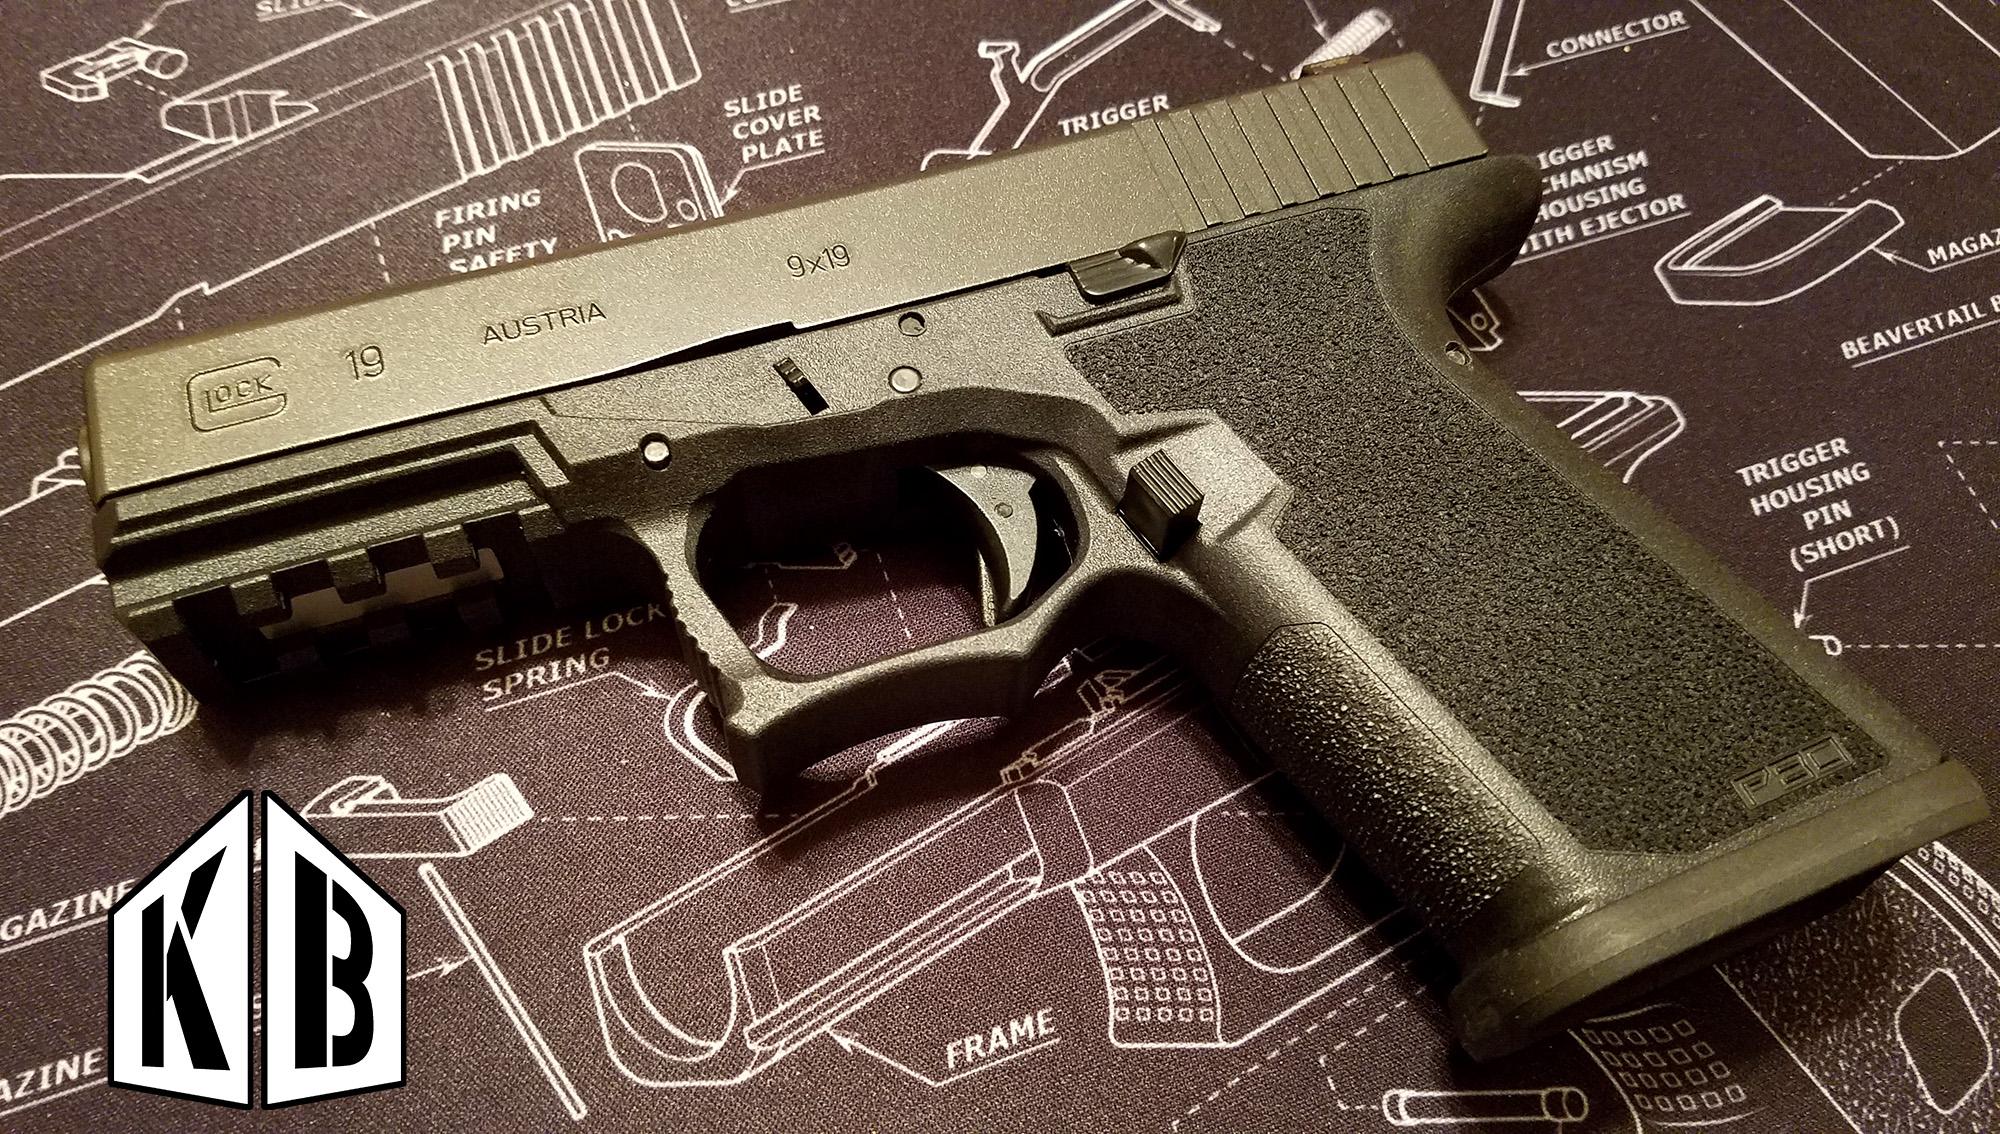 Polymer80 PF940C Glock 19 - The Kommando Blog